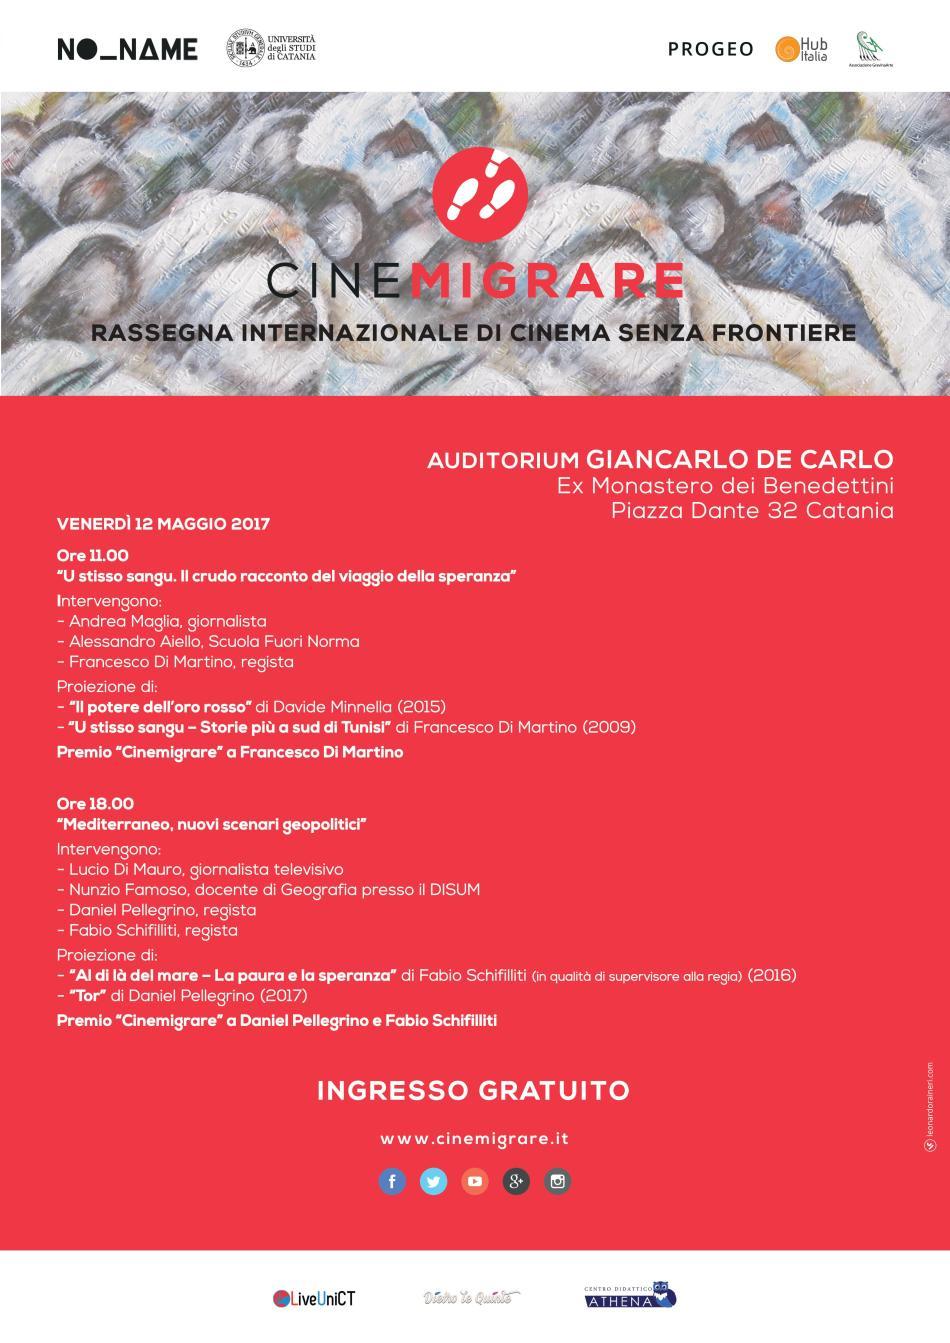 Locandina - CineMigrare 2017.jpg